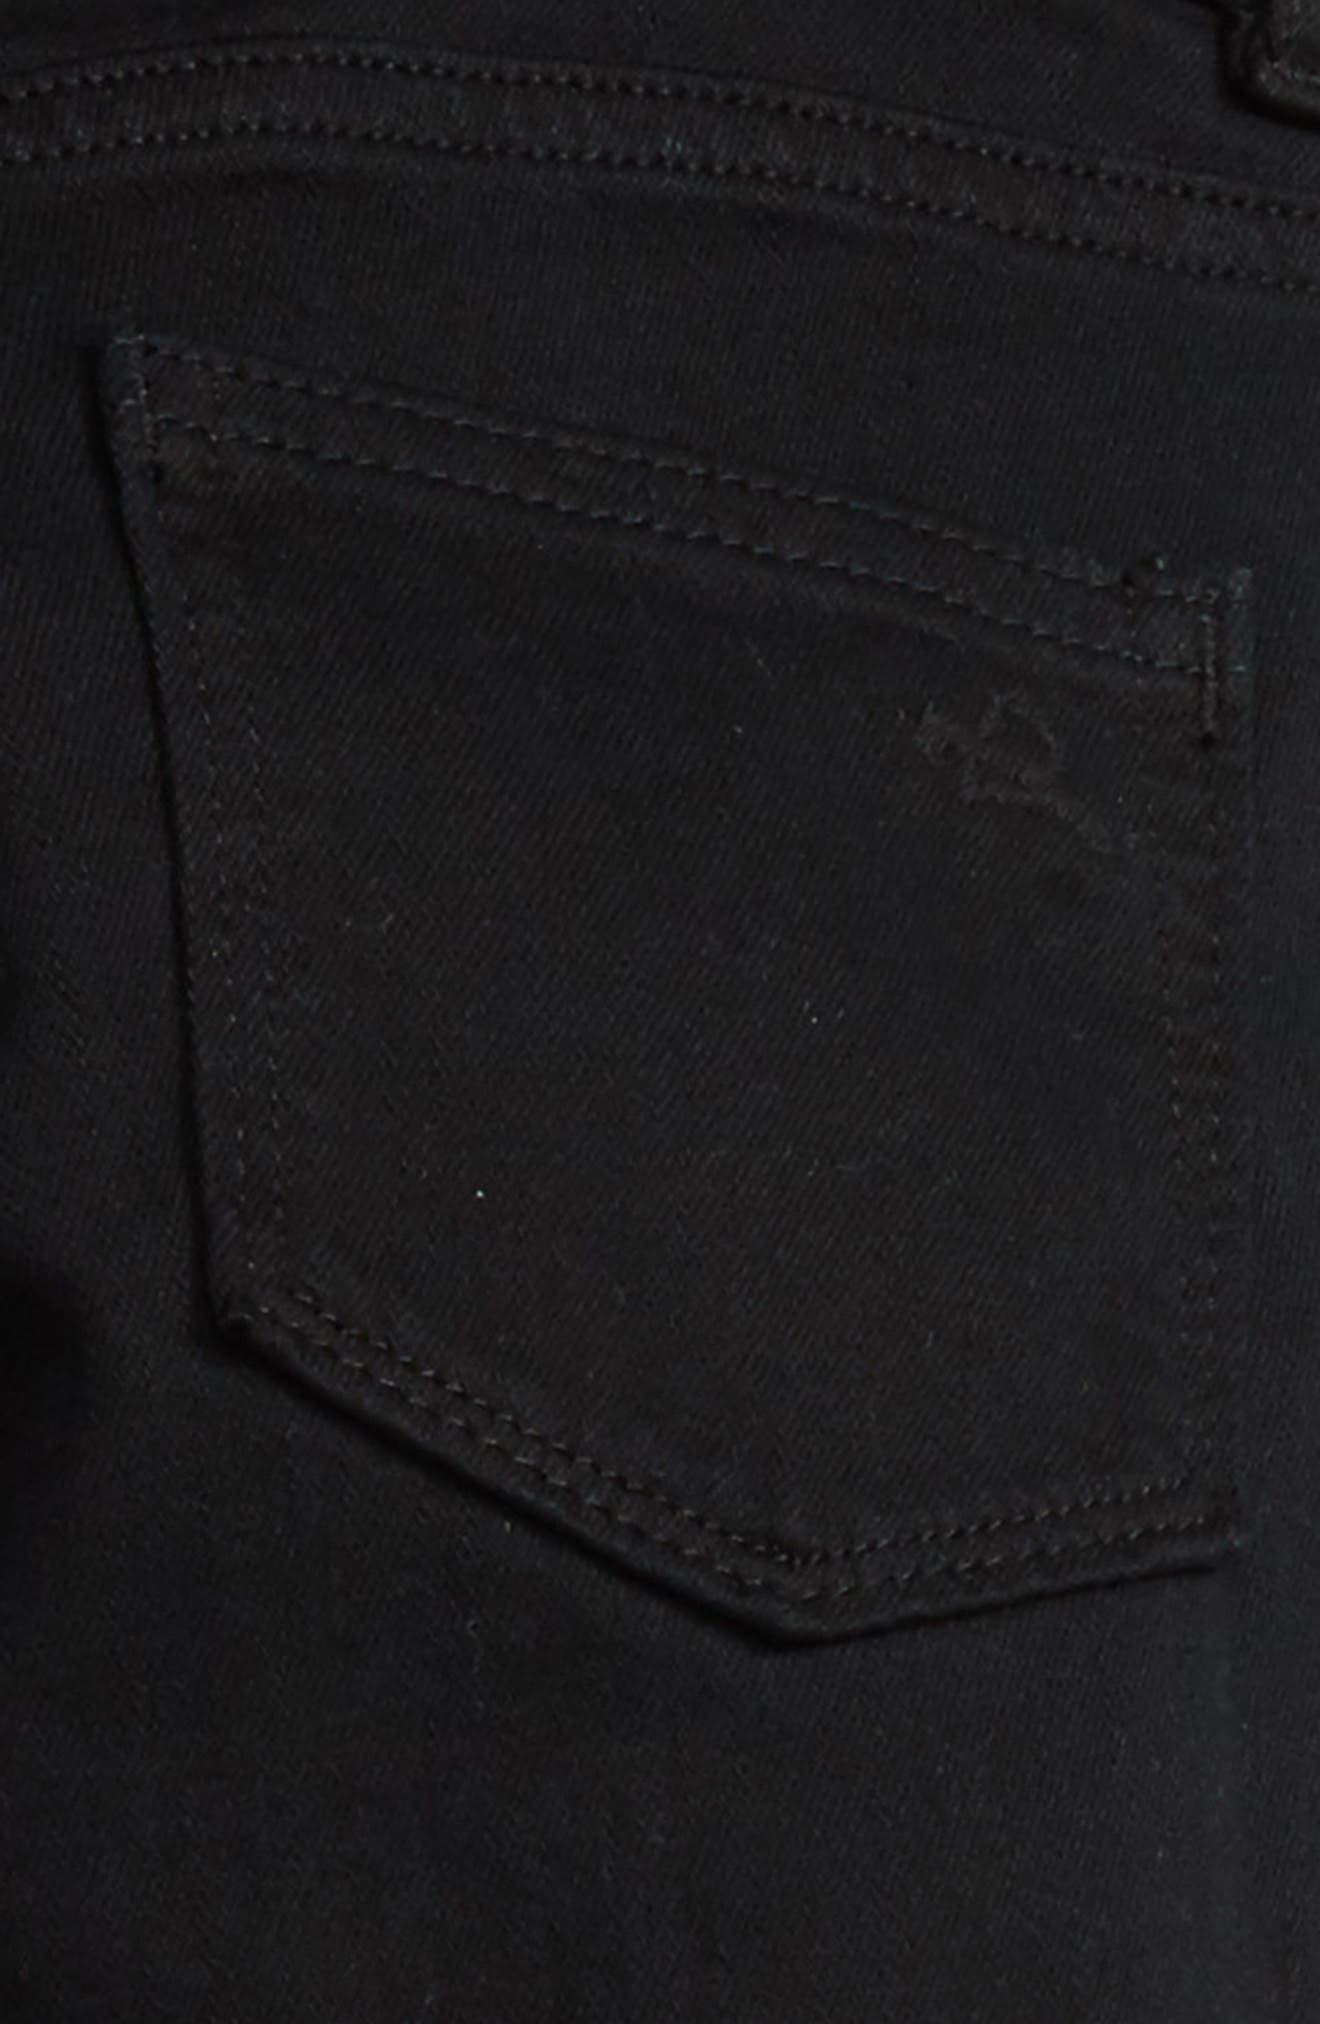 Brady Slim Fit Jeans,                             Alternate thumbnail 3, color,                             BLACK